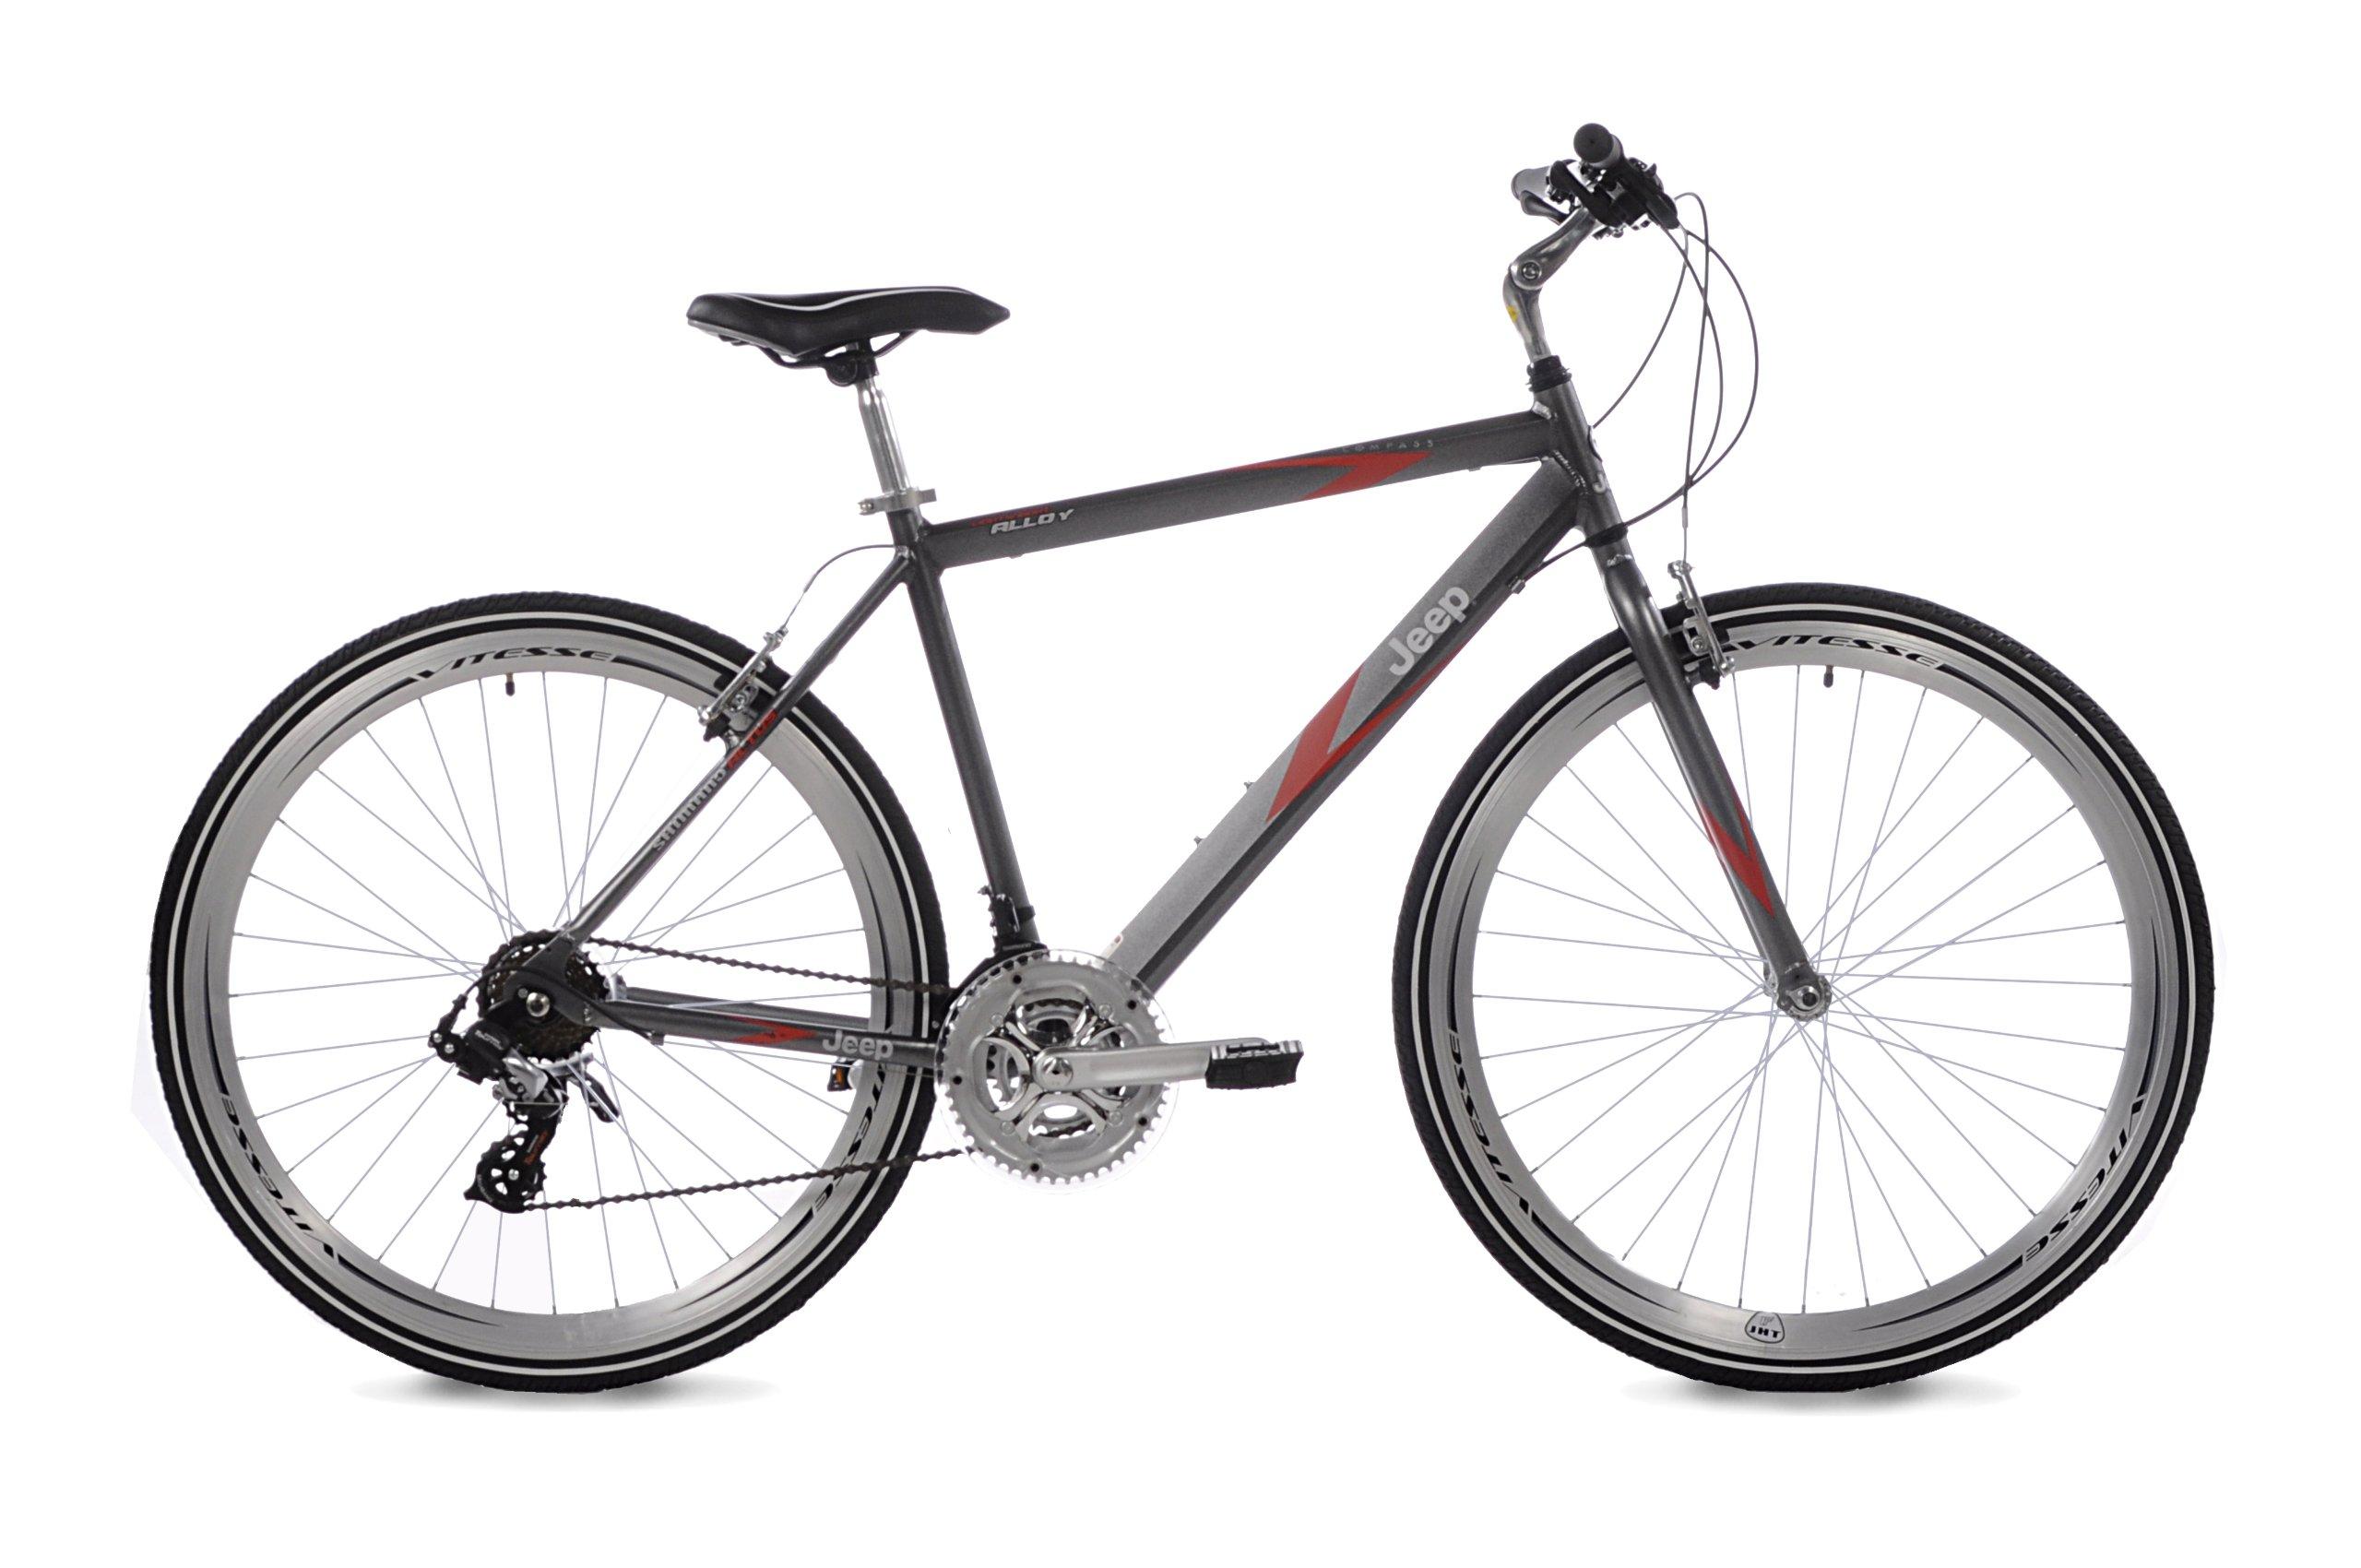 White bicycle road lightweight aluminum frame 21 speed drivetrain Men/'s Bike